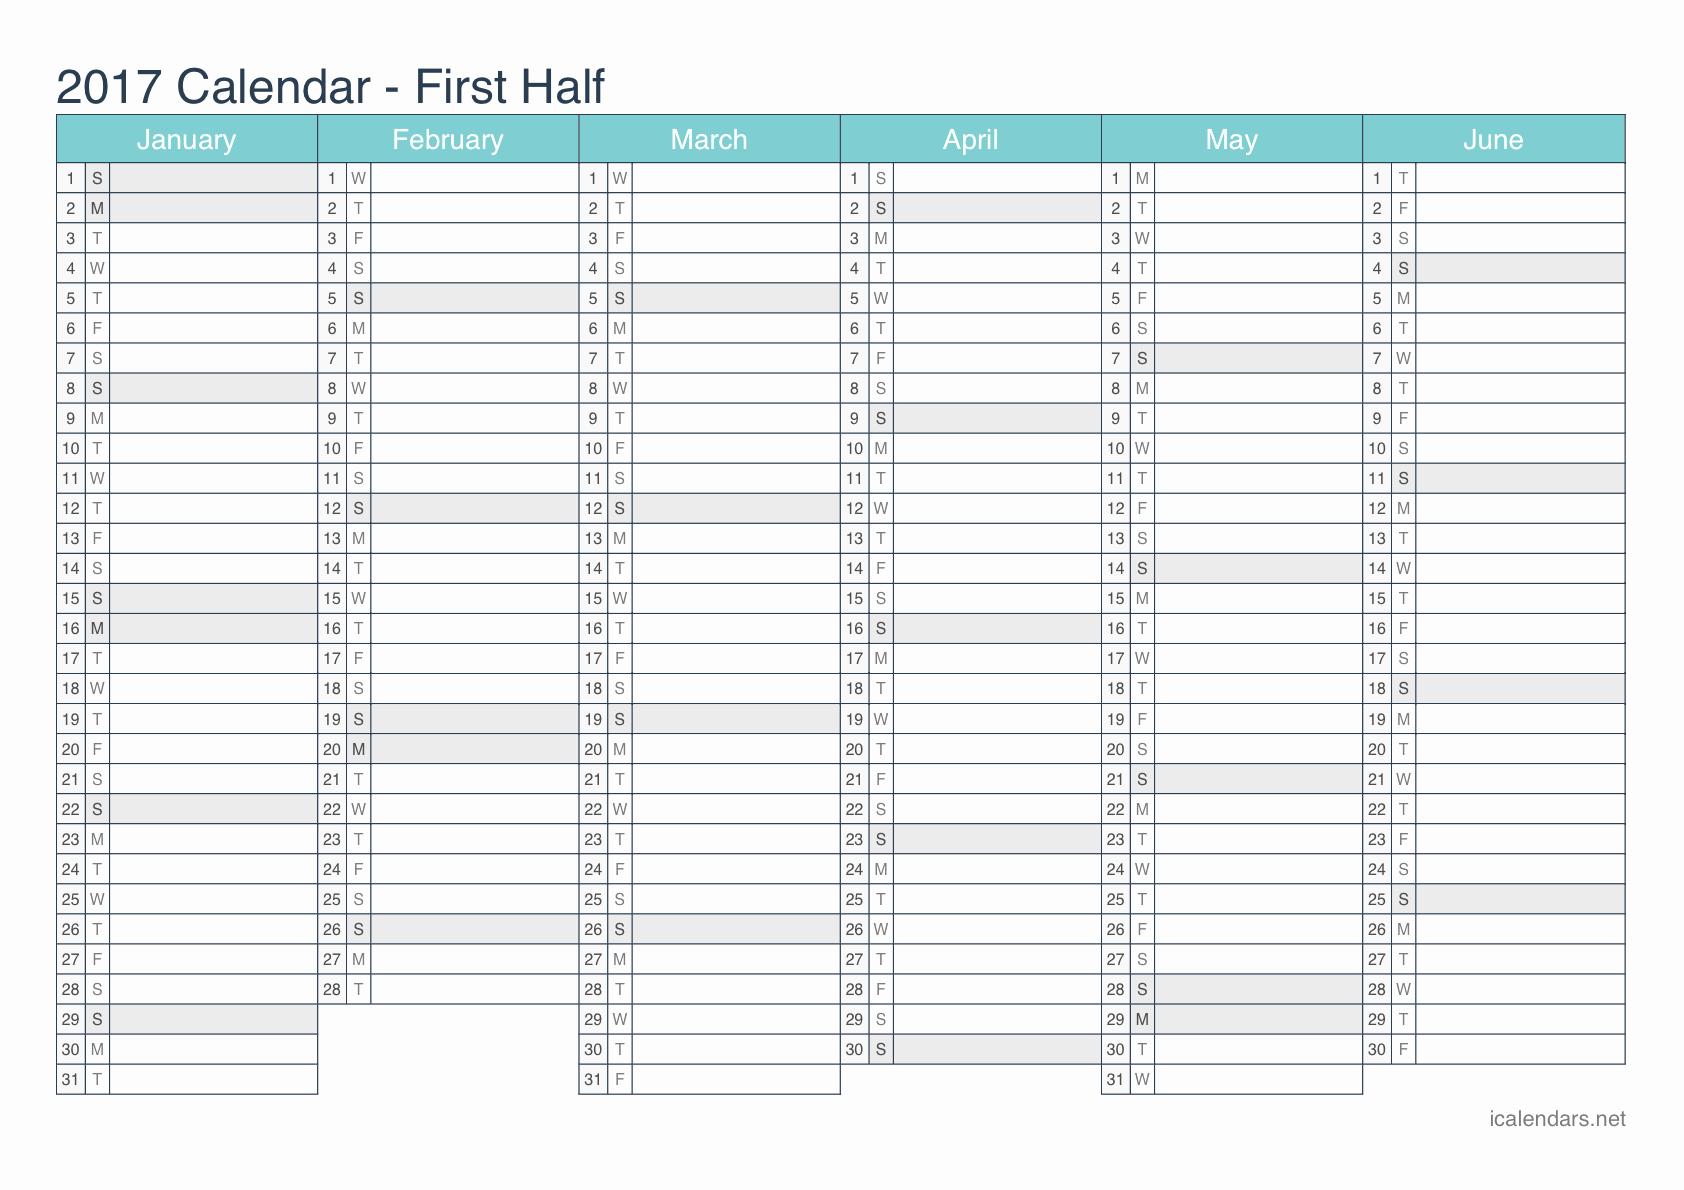 Free Printable Annual Calendar 2017 Fresh Yearly Calendar 2017